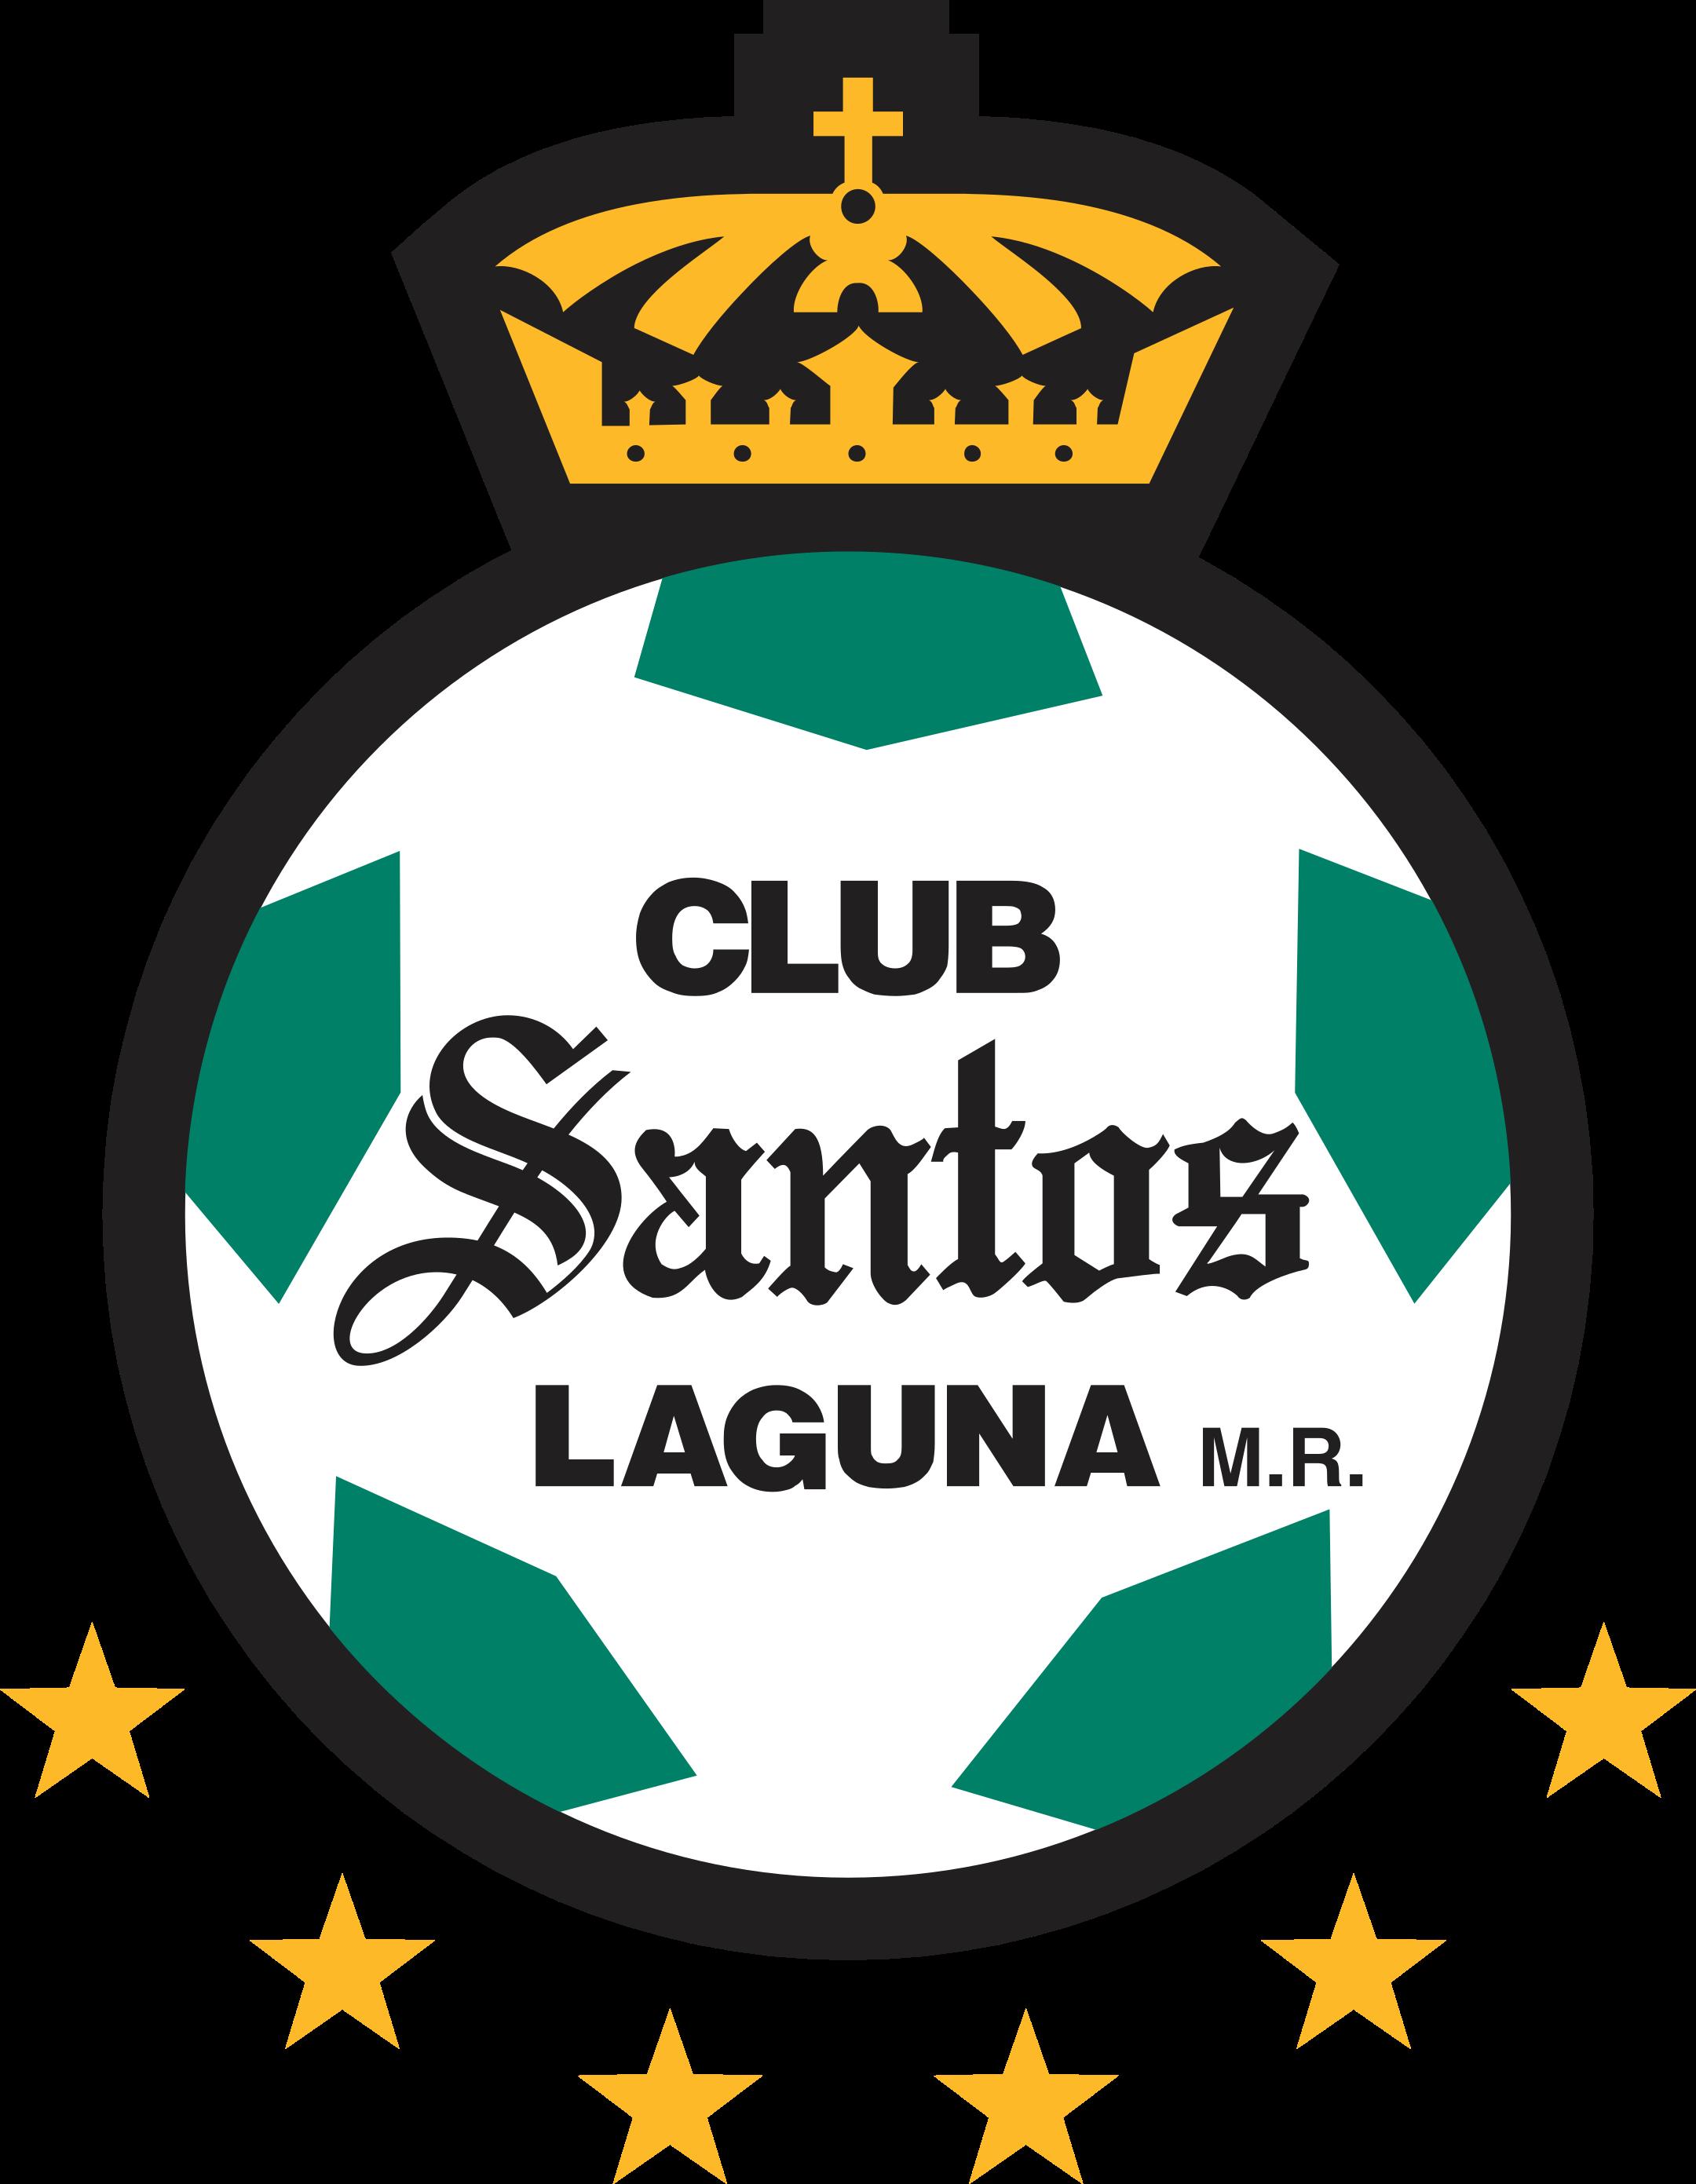 santos laguna logo 1 - Club Santos Laguna Logo - Escudo